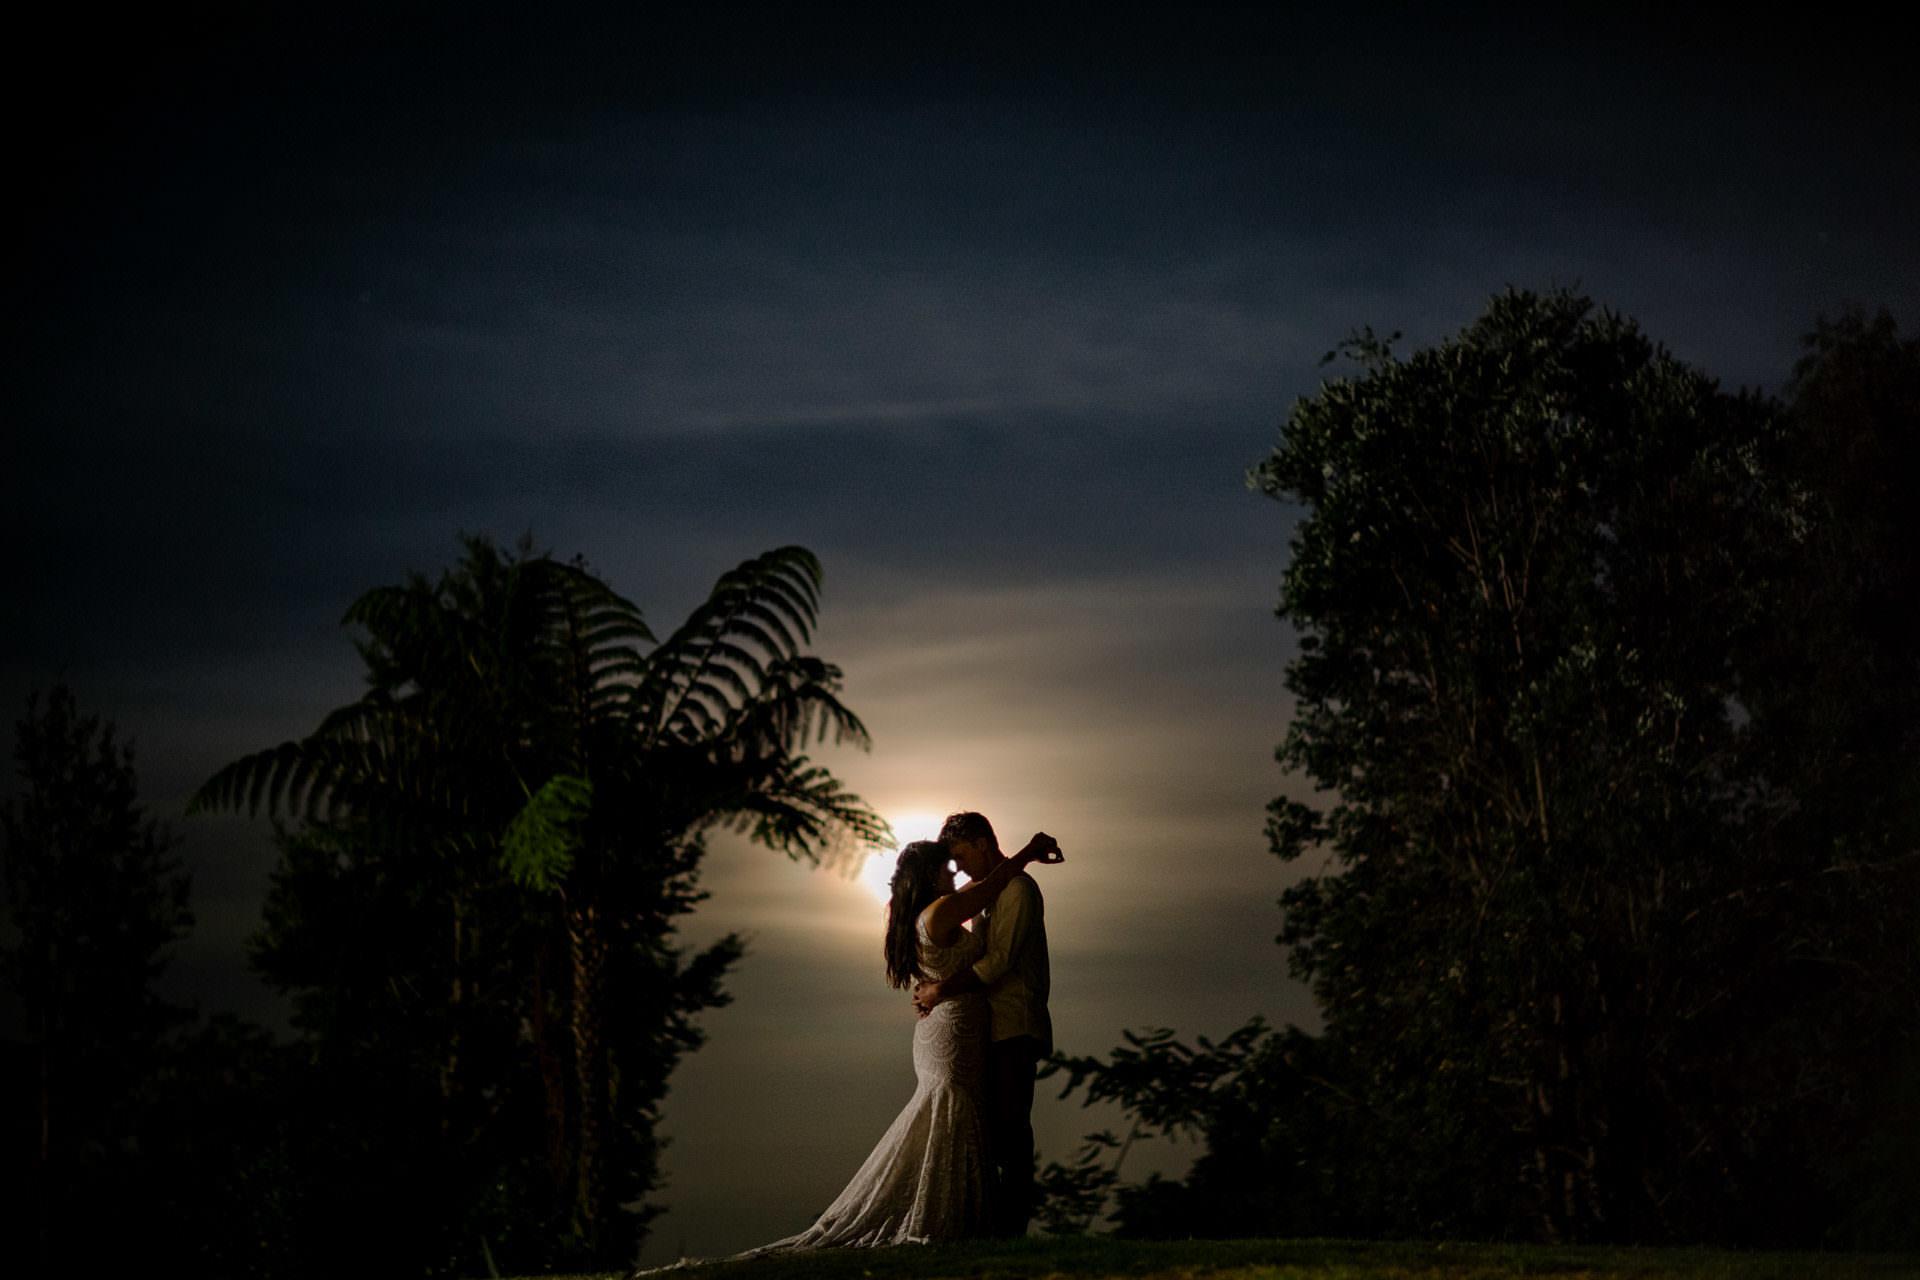 Couple under the moon light